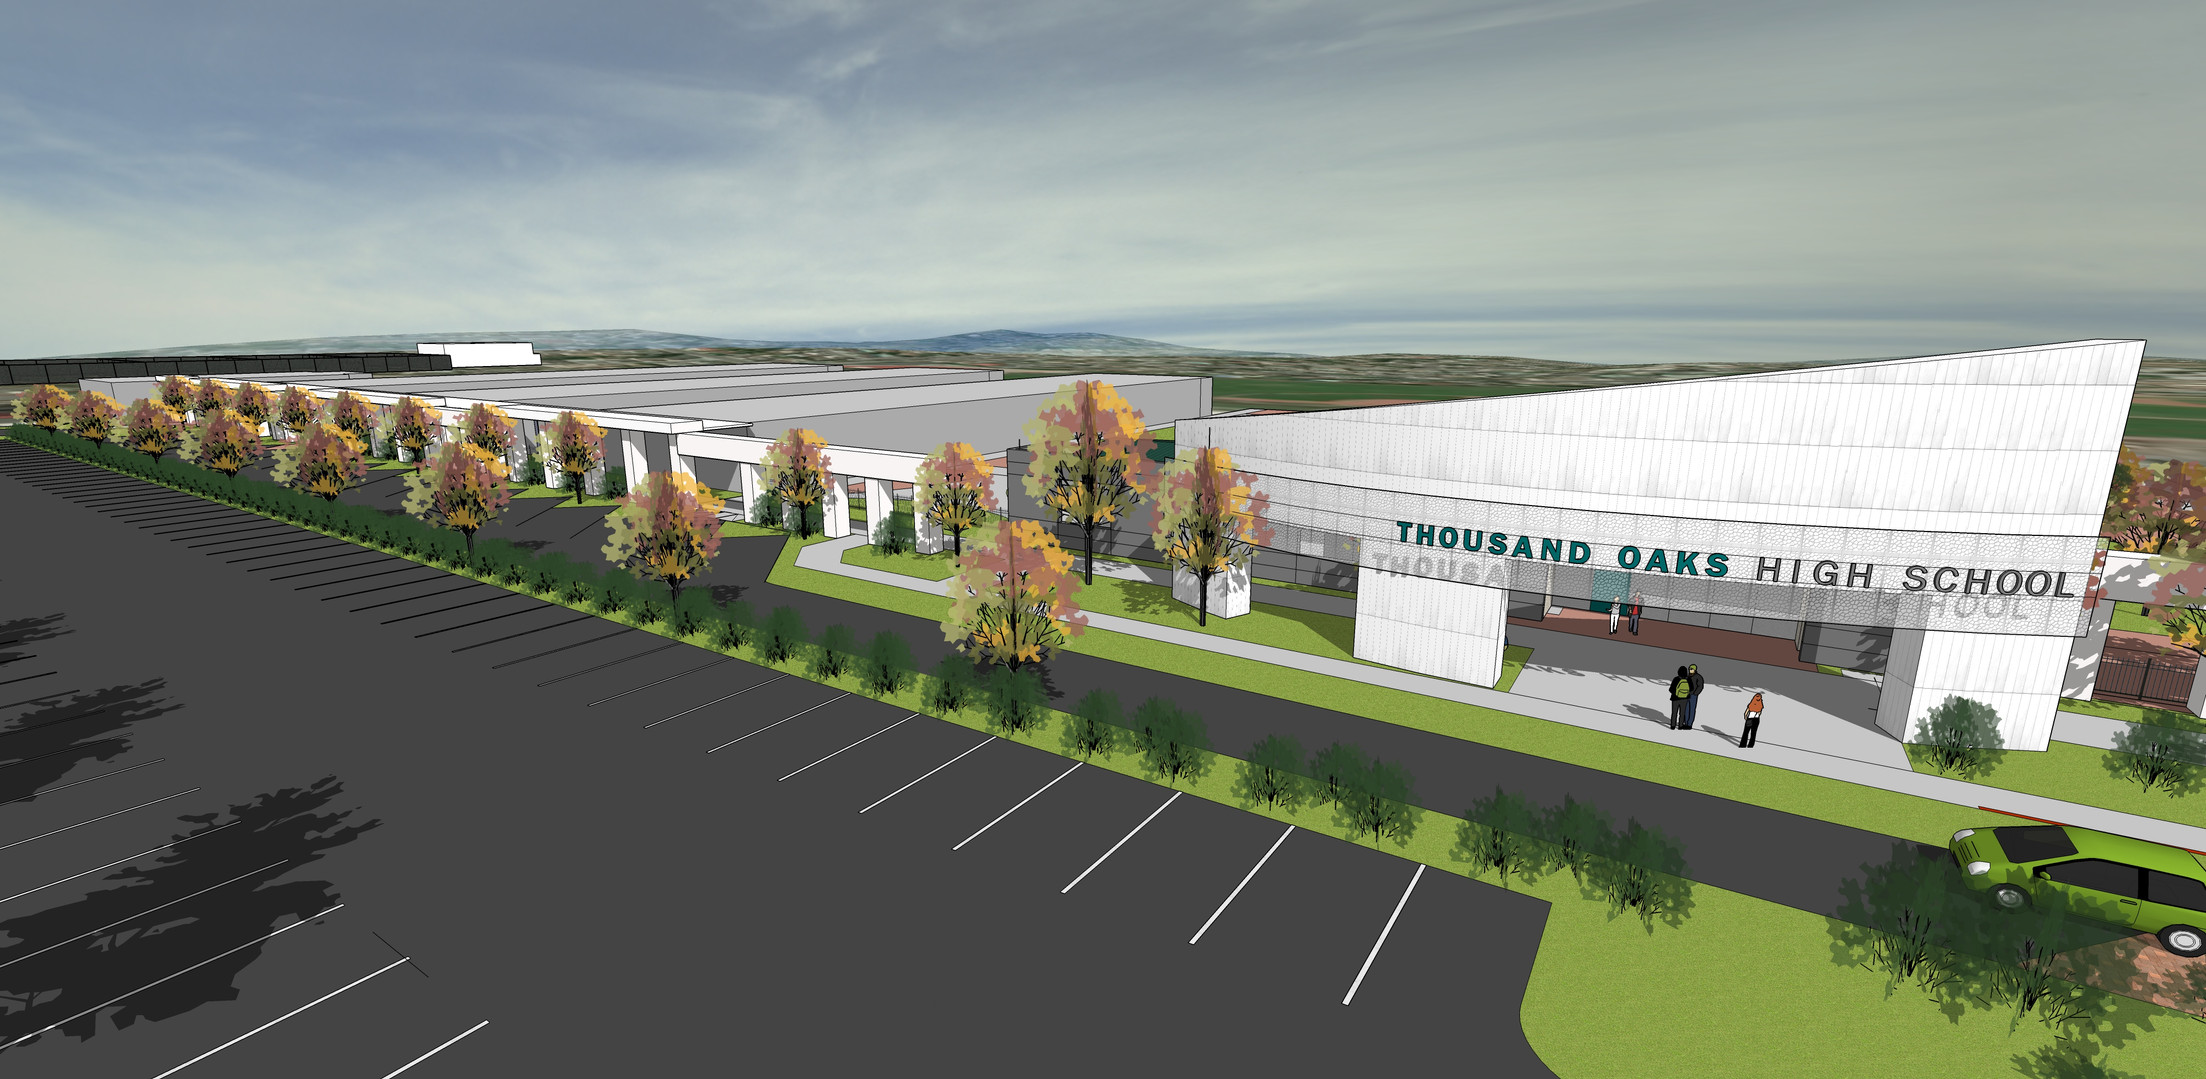 Thousand Oaks High School- Entry Remodel (Design)